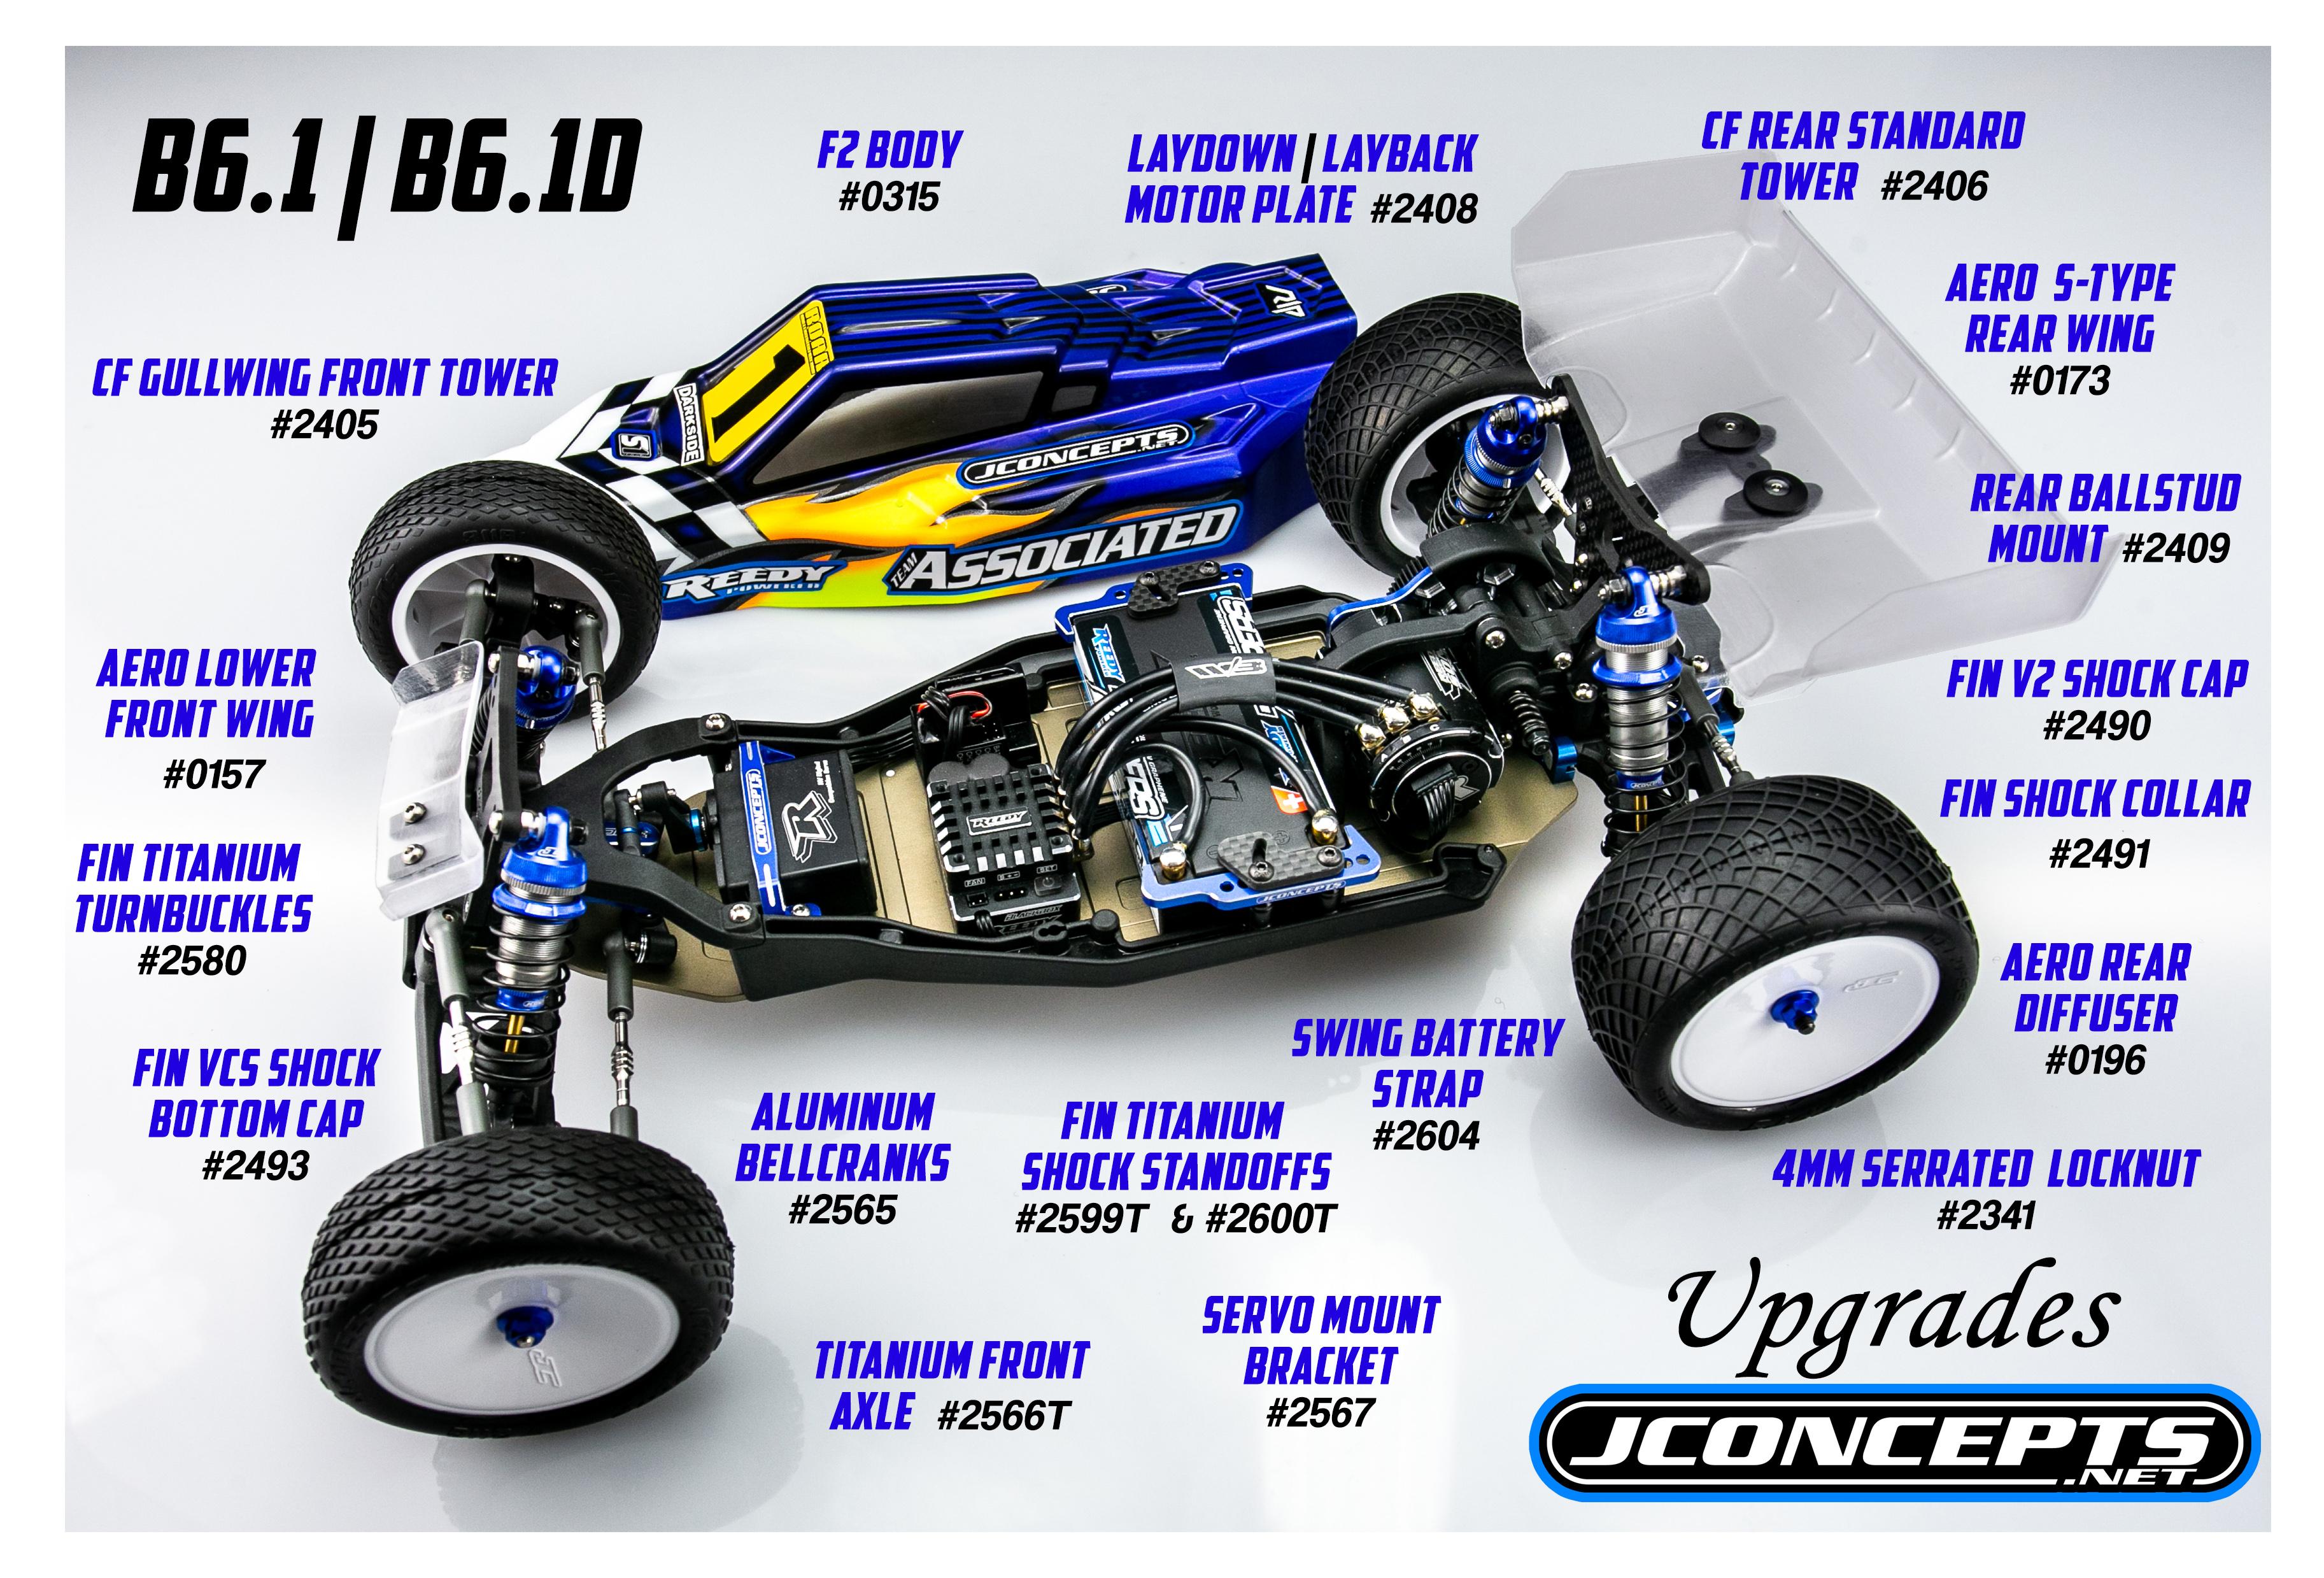 for B6.1 Laydown Gearbox Team Associated